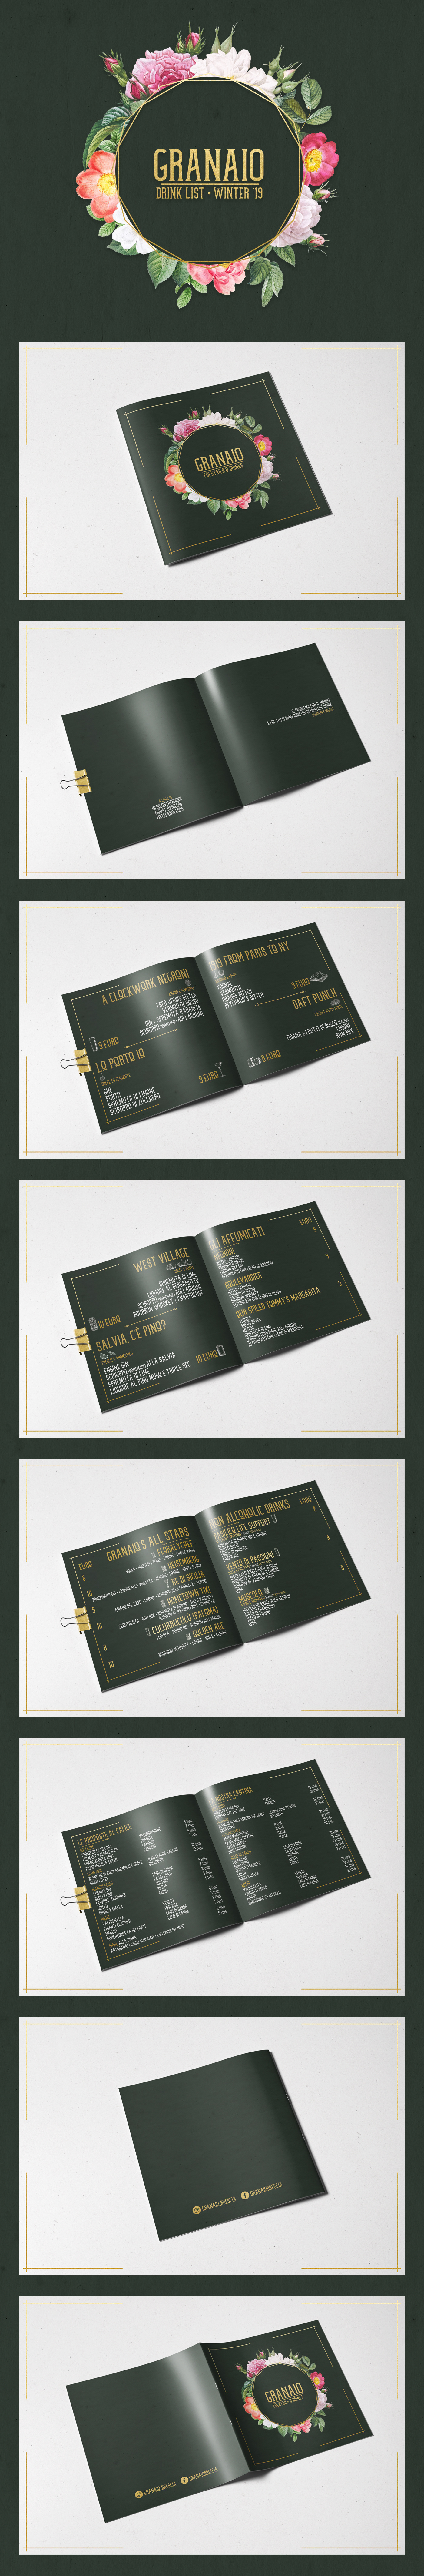 cocktails drink list graphic design  print